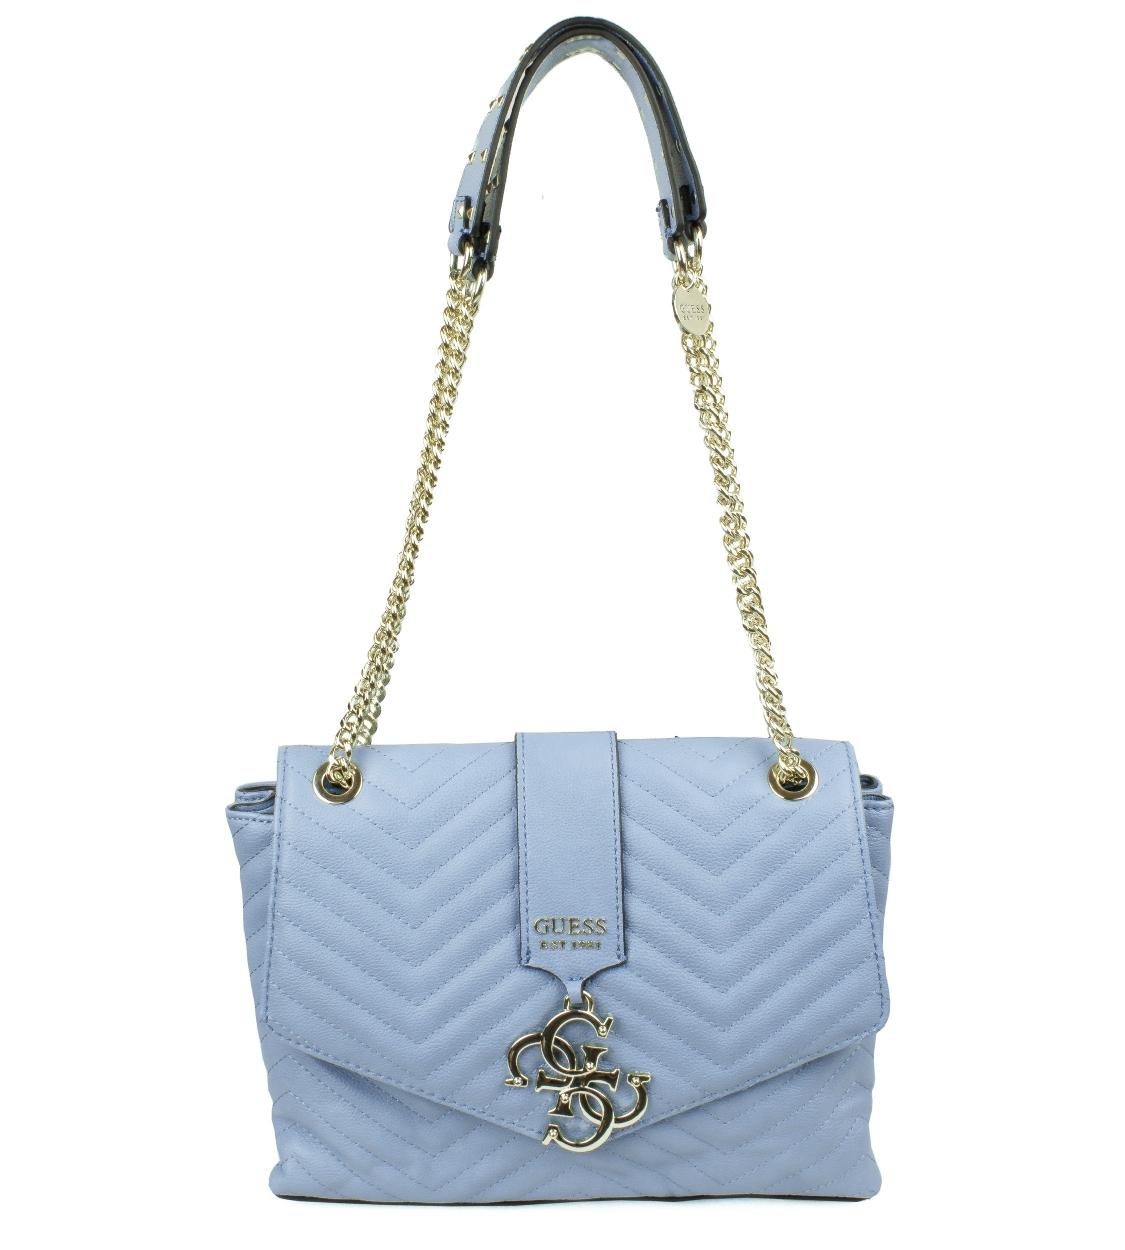 Dámská světle modrá kabelka Guess c3a87c3d4ac